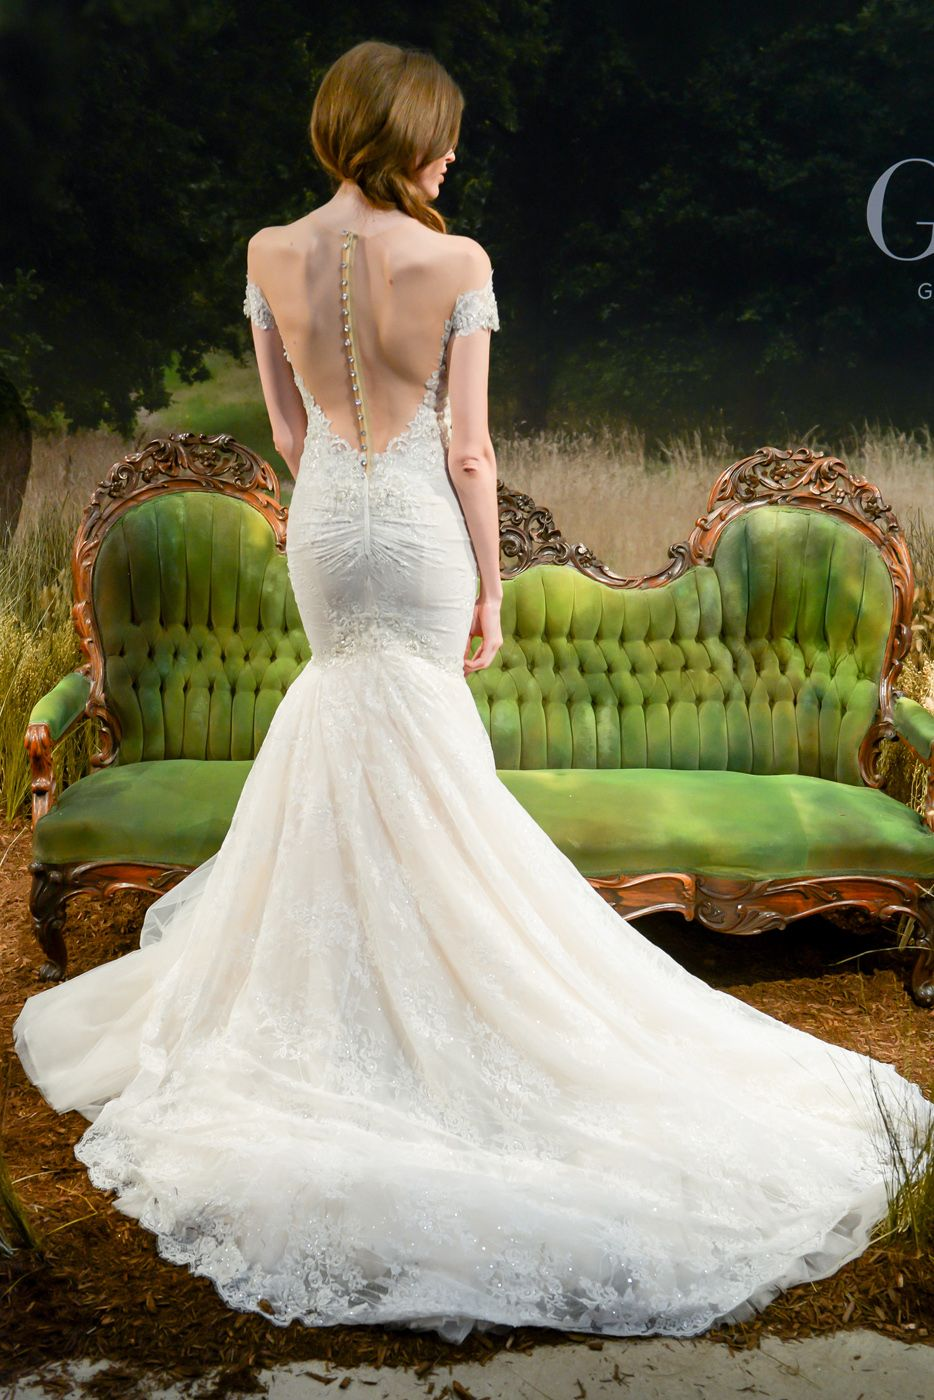 Stunning wedding dresses  The Most Stunning OfftheShoulder Wedding Dresses From Bridal